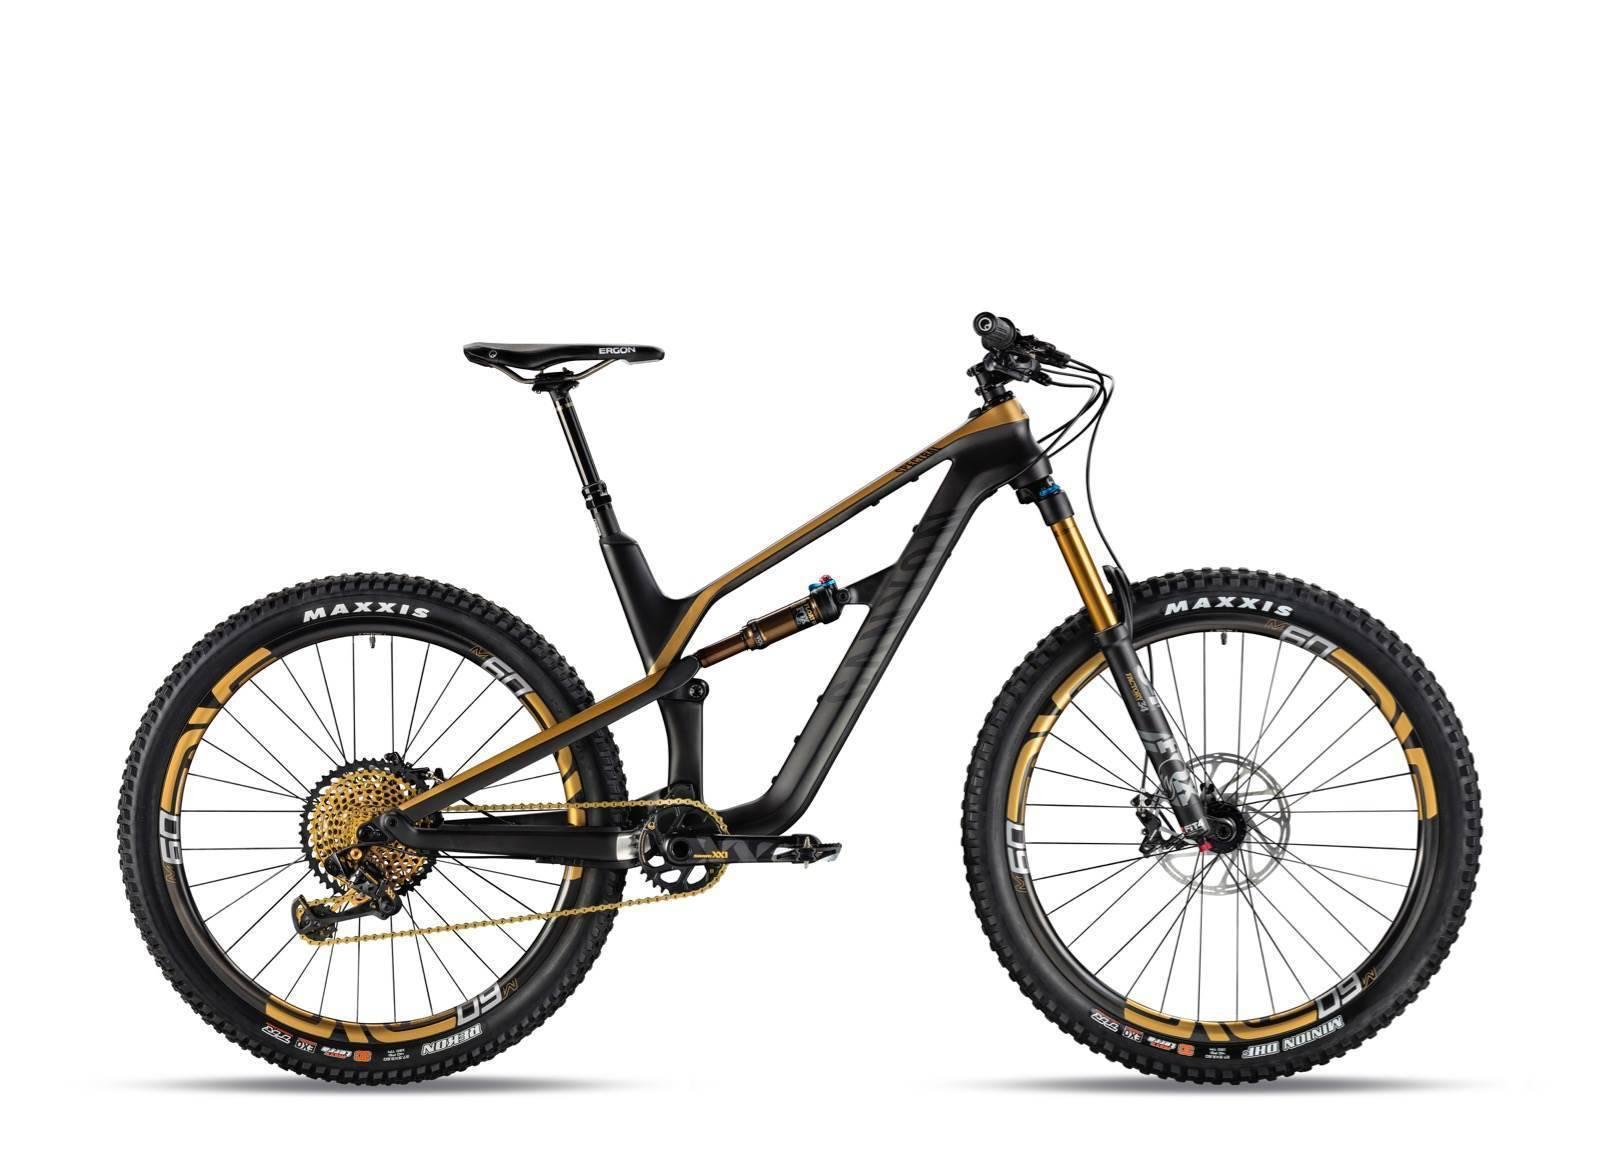 Canyon launch an all-new Spectral - Australian Mountain Bike | The ...